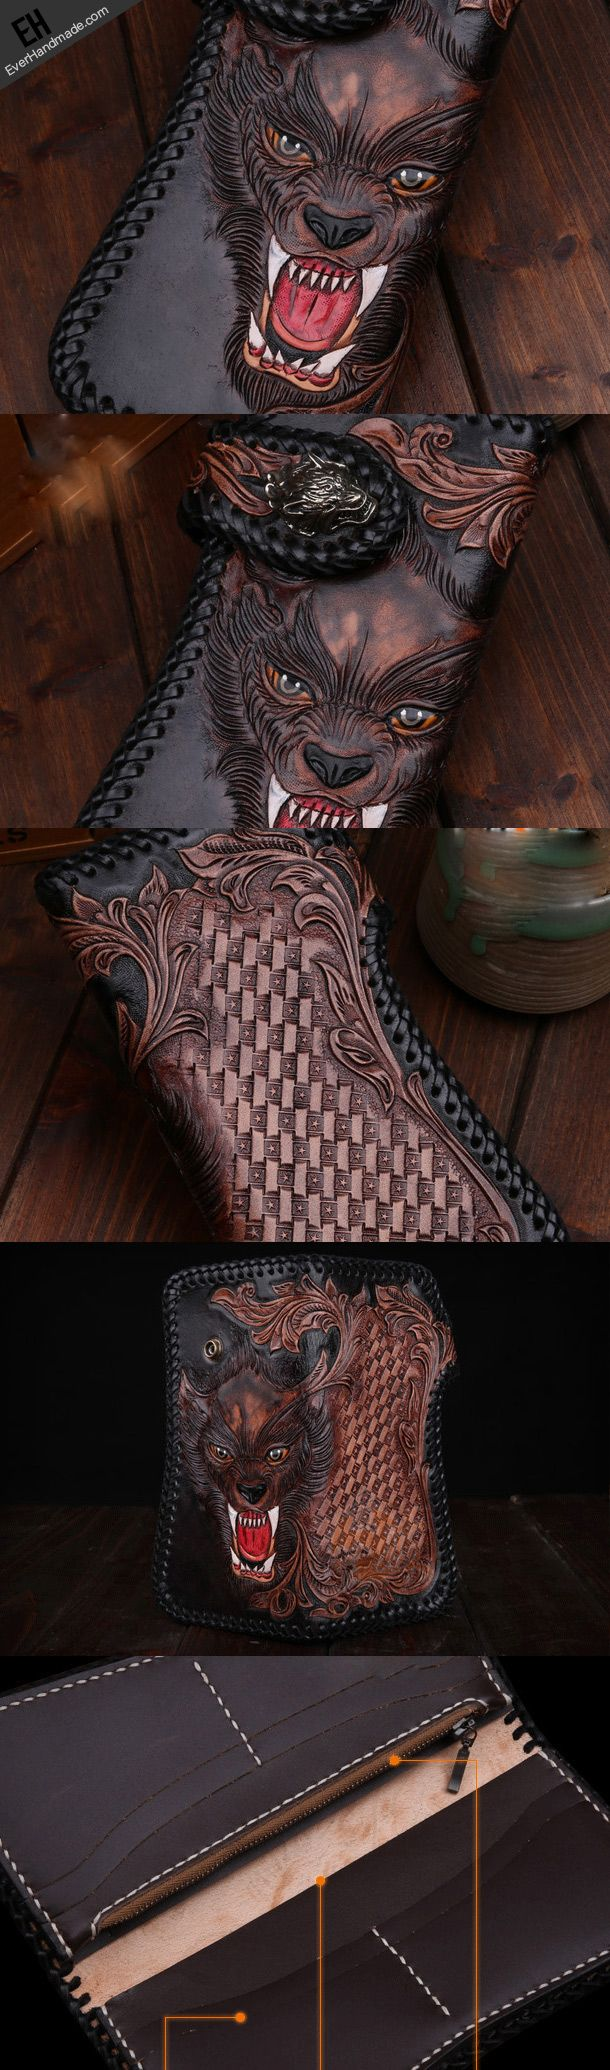 Handmade leather biker trucker wolf wallet leather chain men Black Carved Tooled wallet